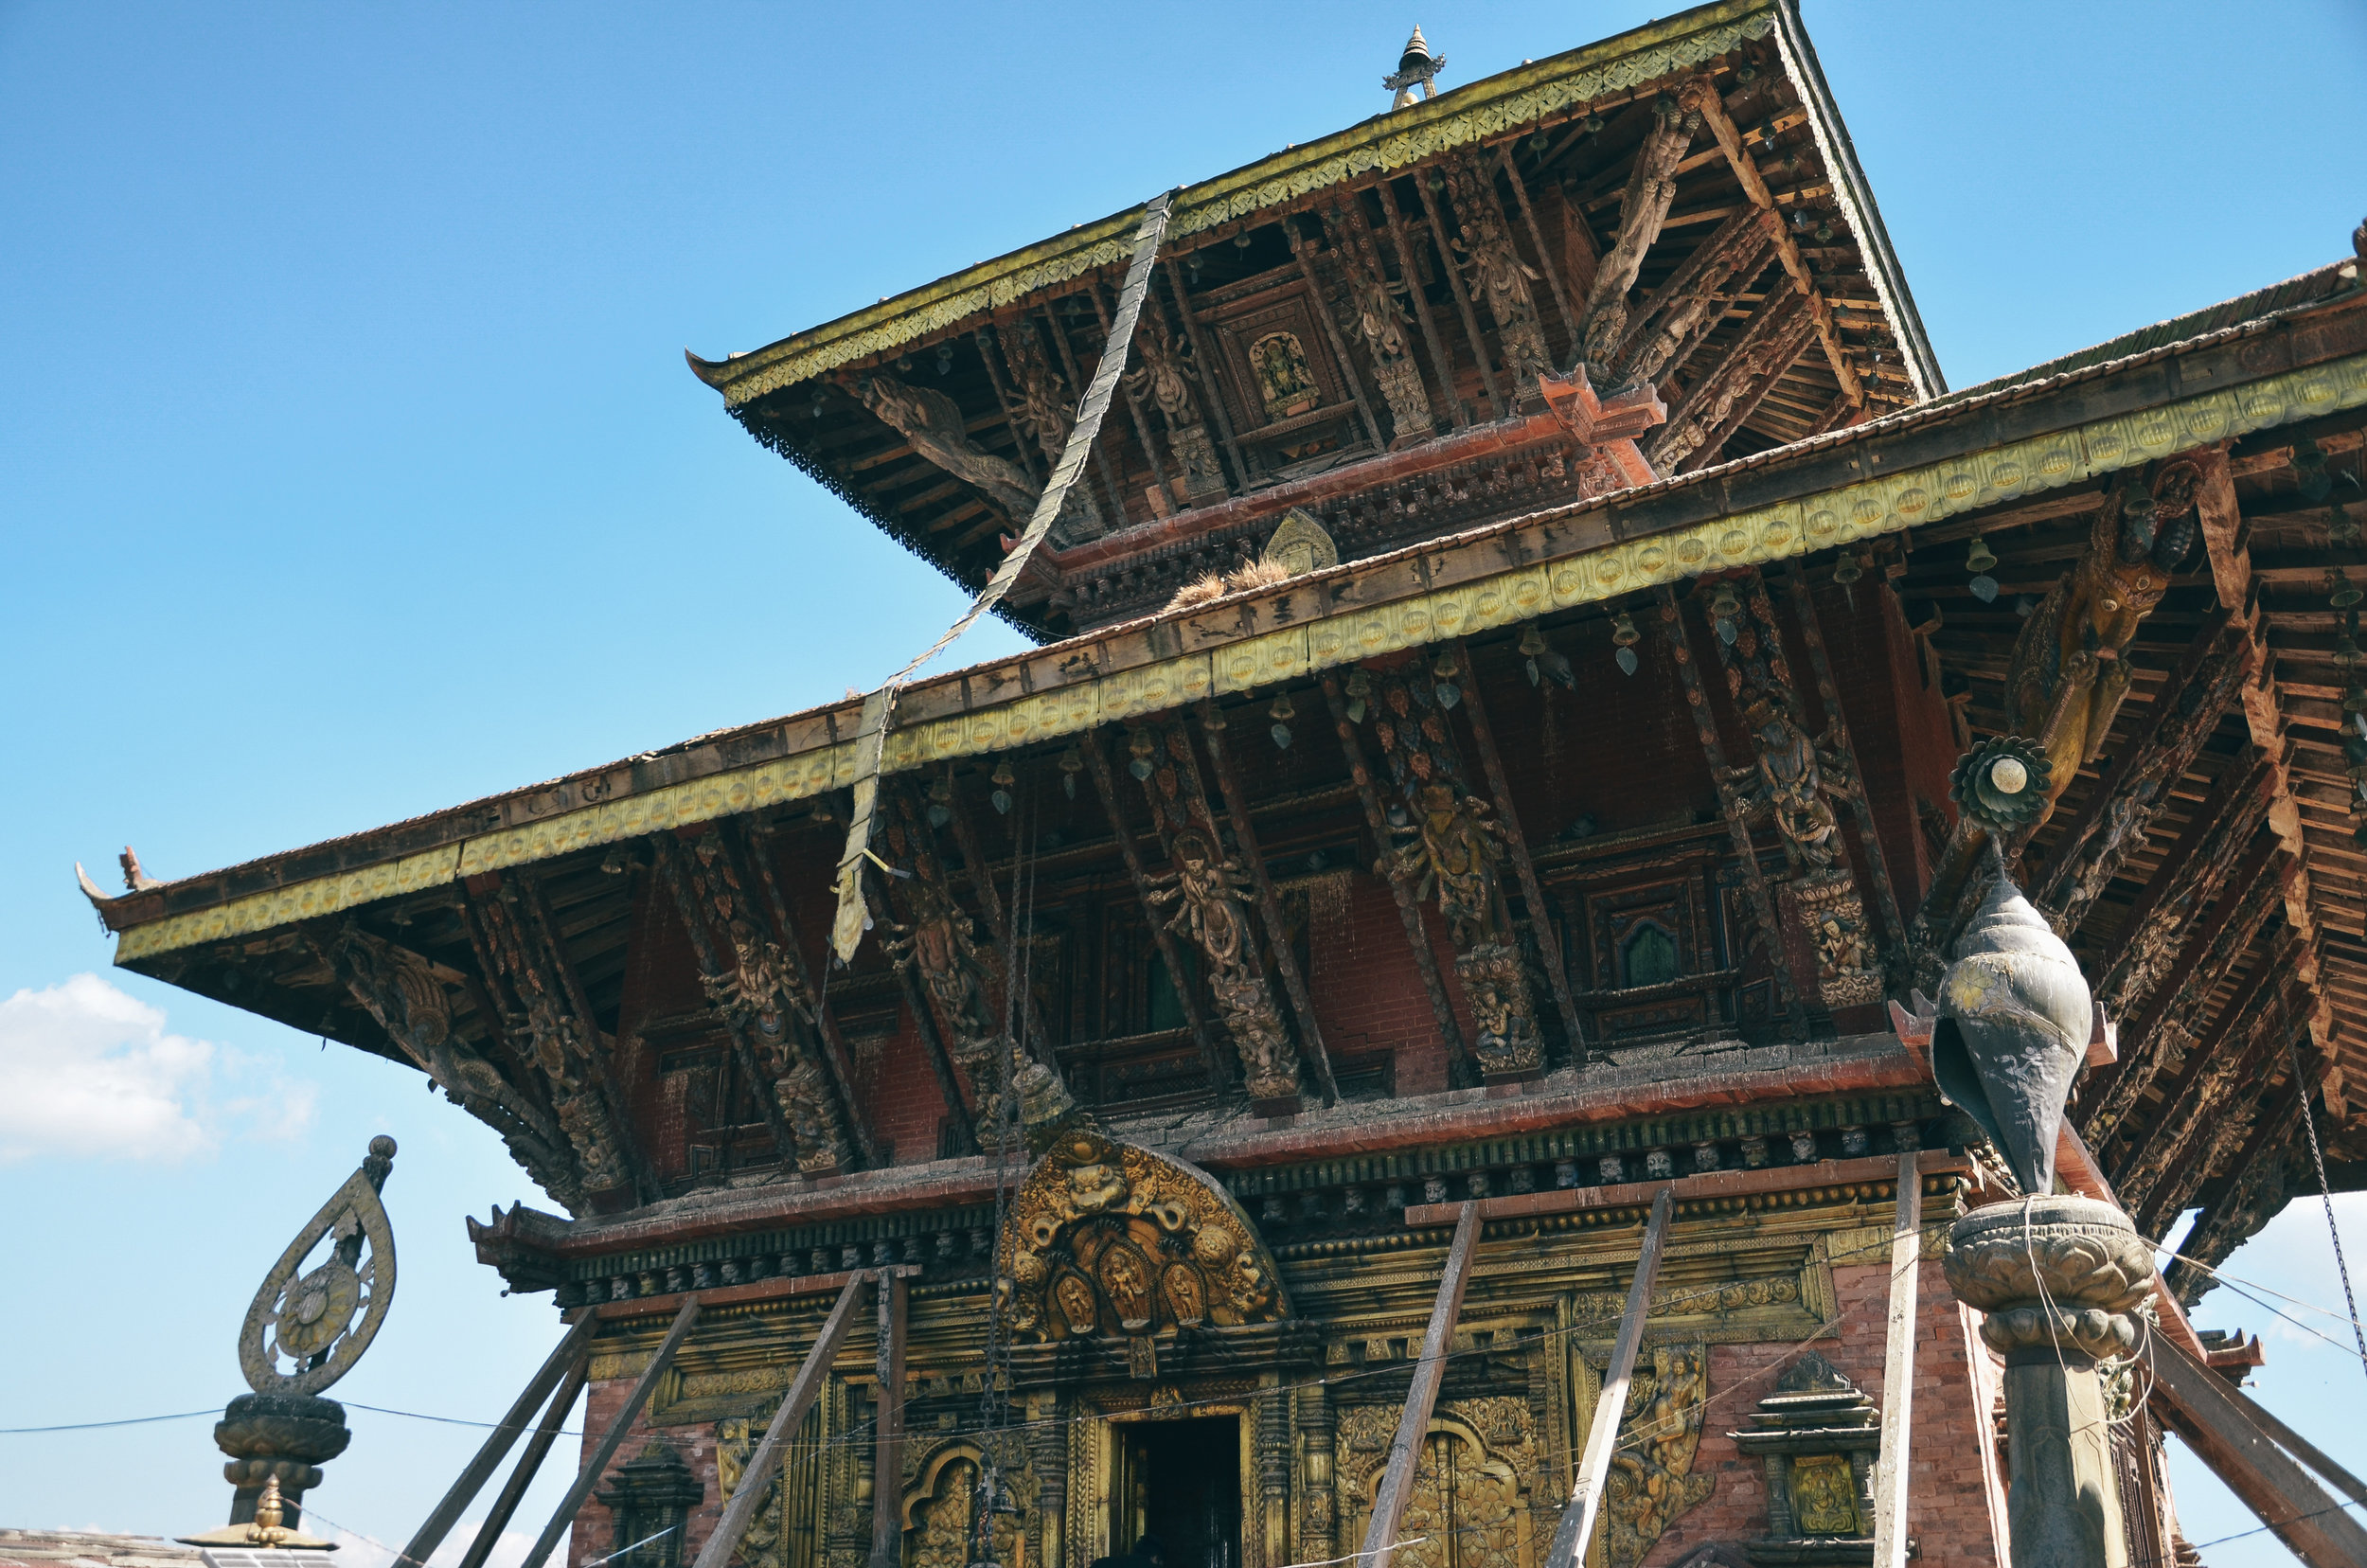 10-things-to-know-kathmandu-nepal-lifeonpine_DSC_0615.jpg